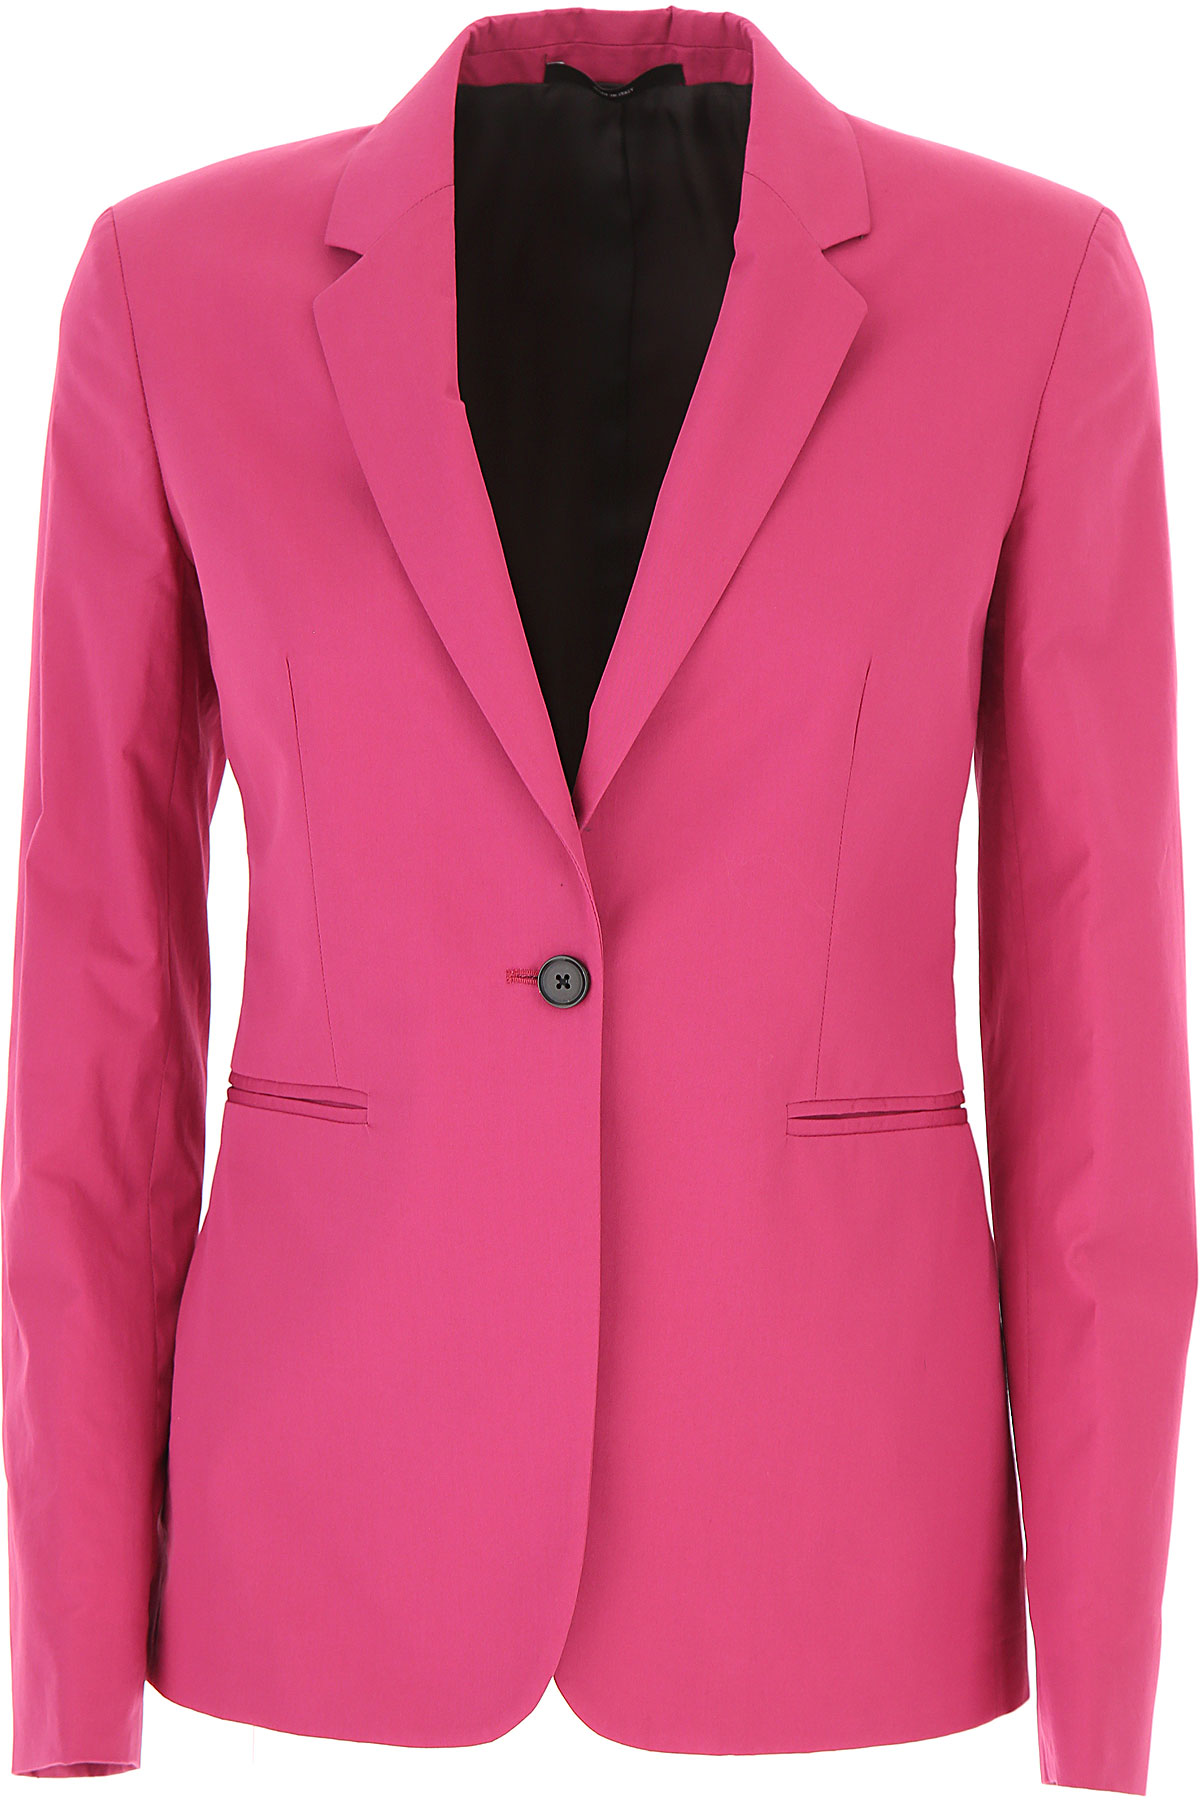 Paul Smith Blazer for Women On Sale, fuxia, Cotton, 2019, 4 6 8